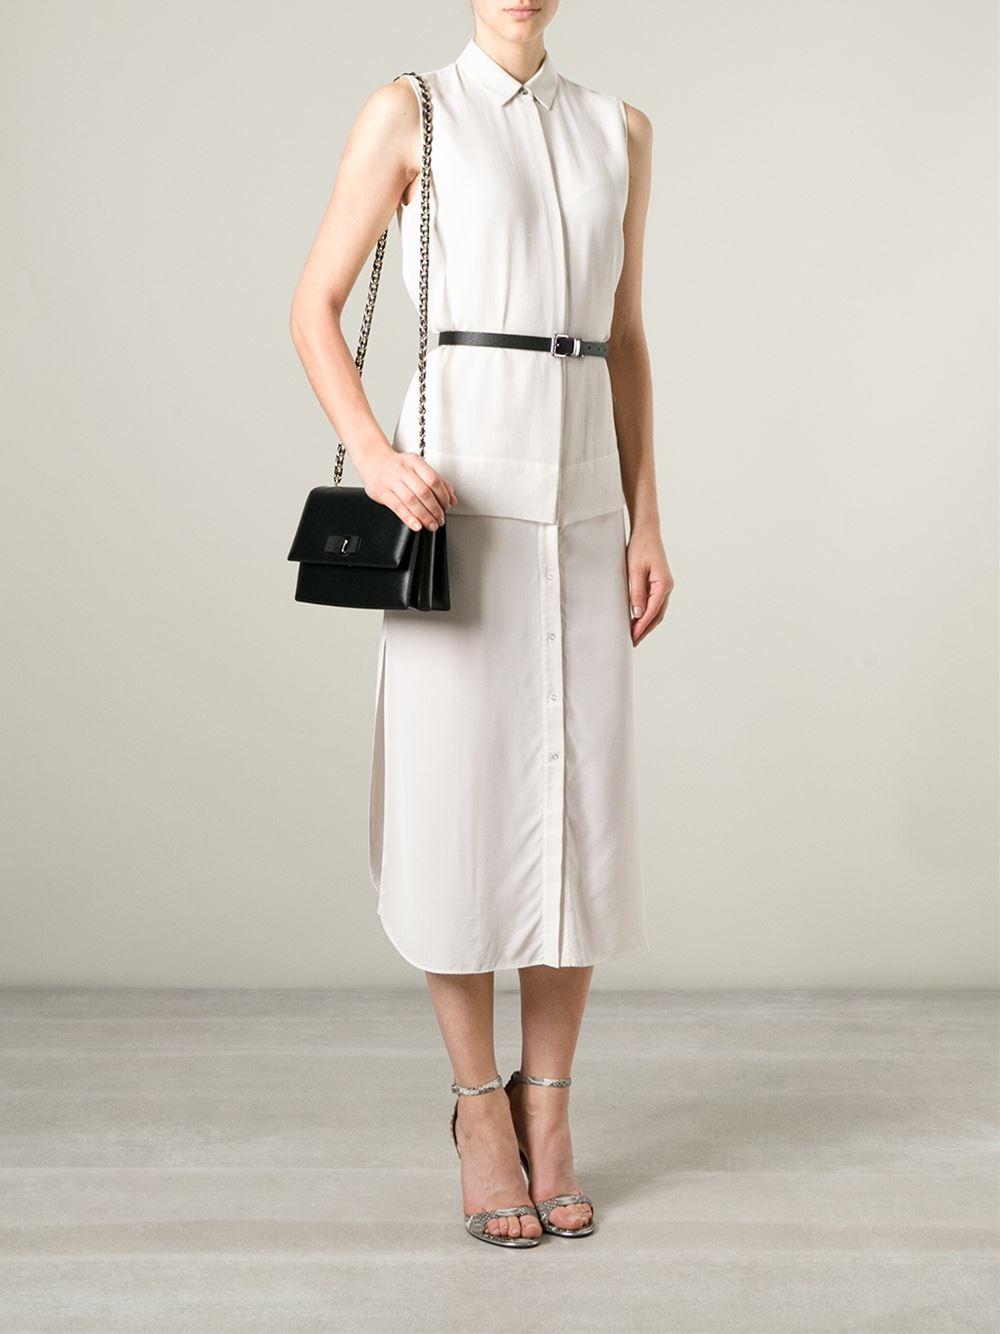 5313d2557d7 Lyst - Ferragamo Ginny Shoulder Bag in Black